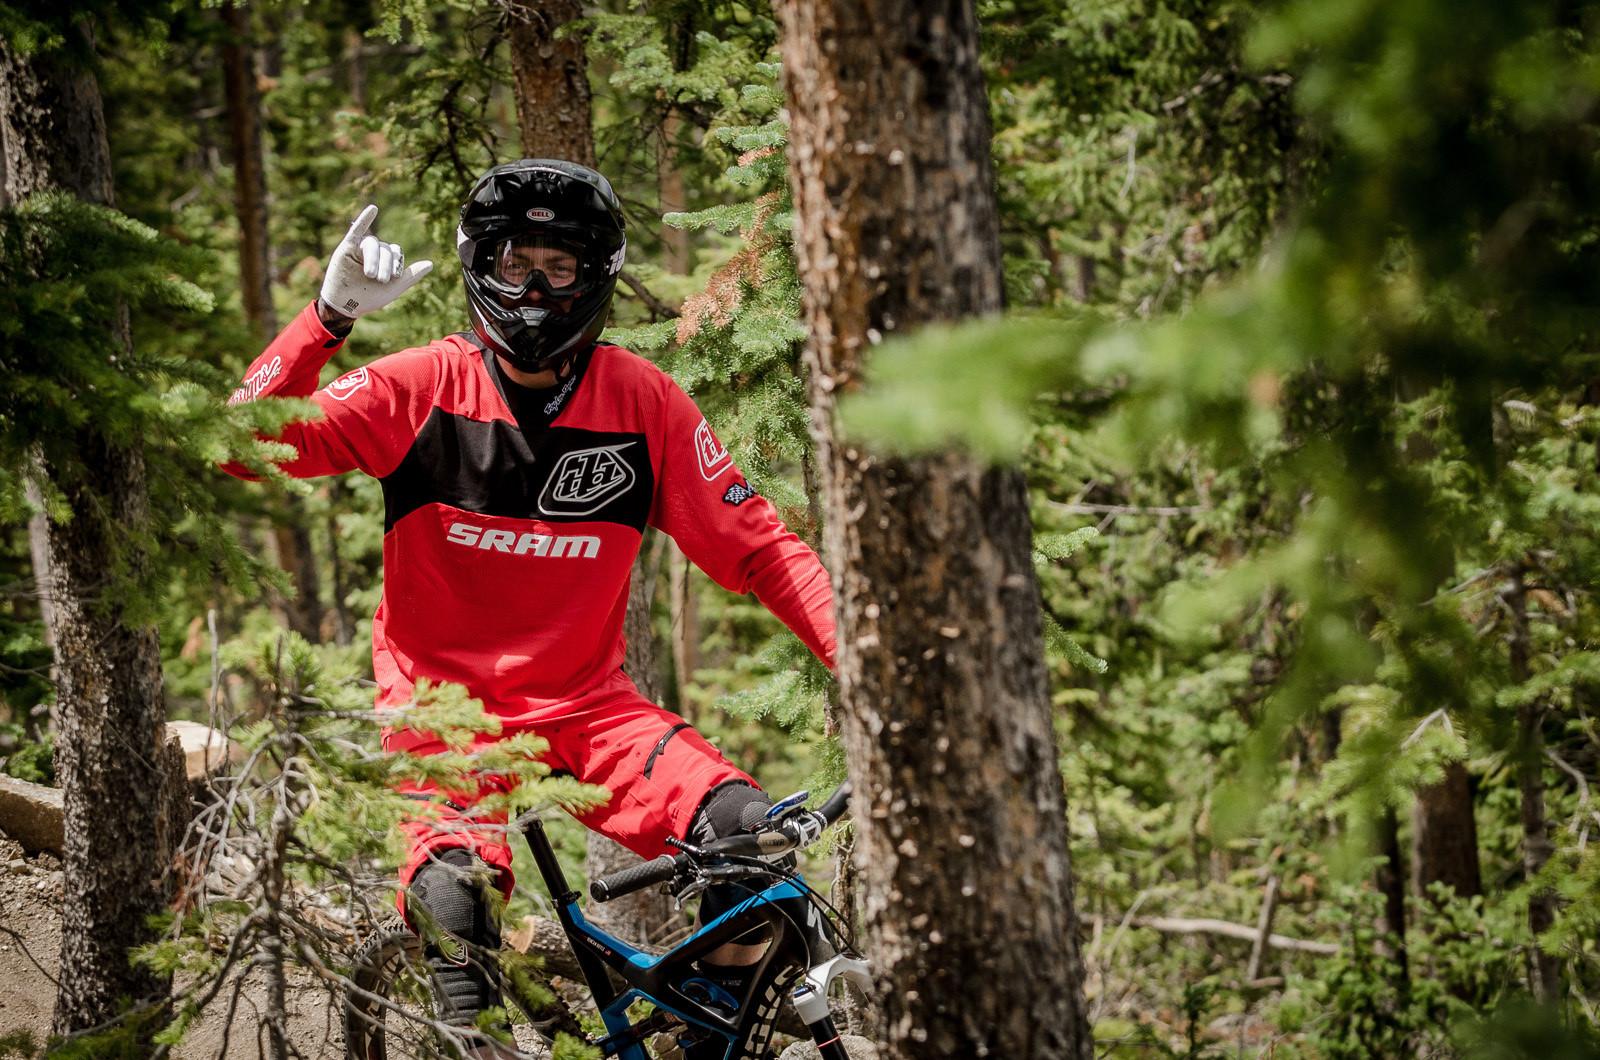 Duncan Riffle, Enduro World Series, Trestle Bike Park - Pit Bits and Action from the Enduro World Series at Trestle Bike Park - Mountain Biking Pictures - Vital MTB